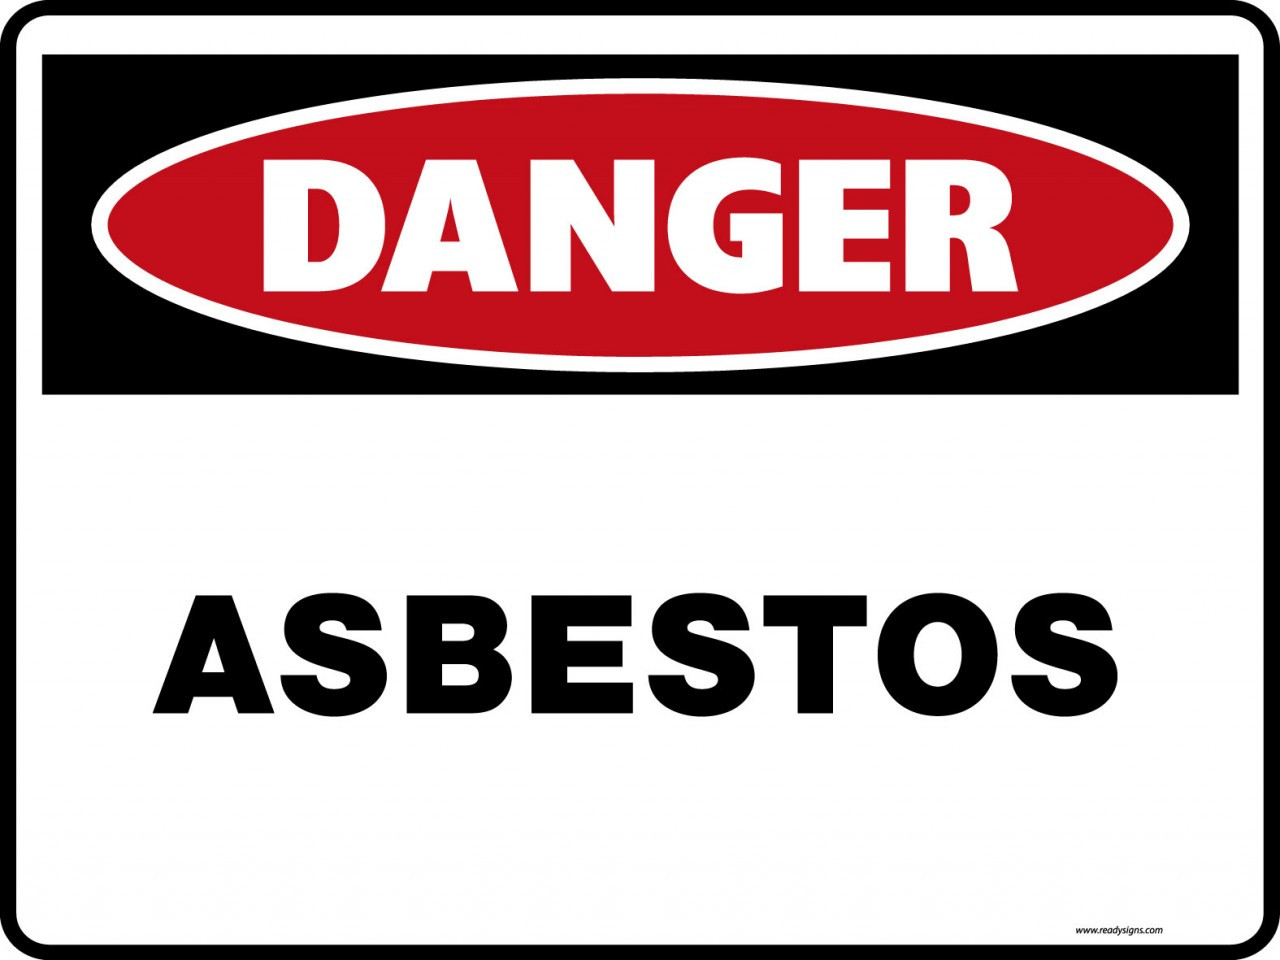 Danger Signs Asbestos Ready Signs